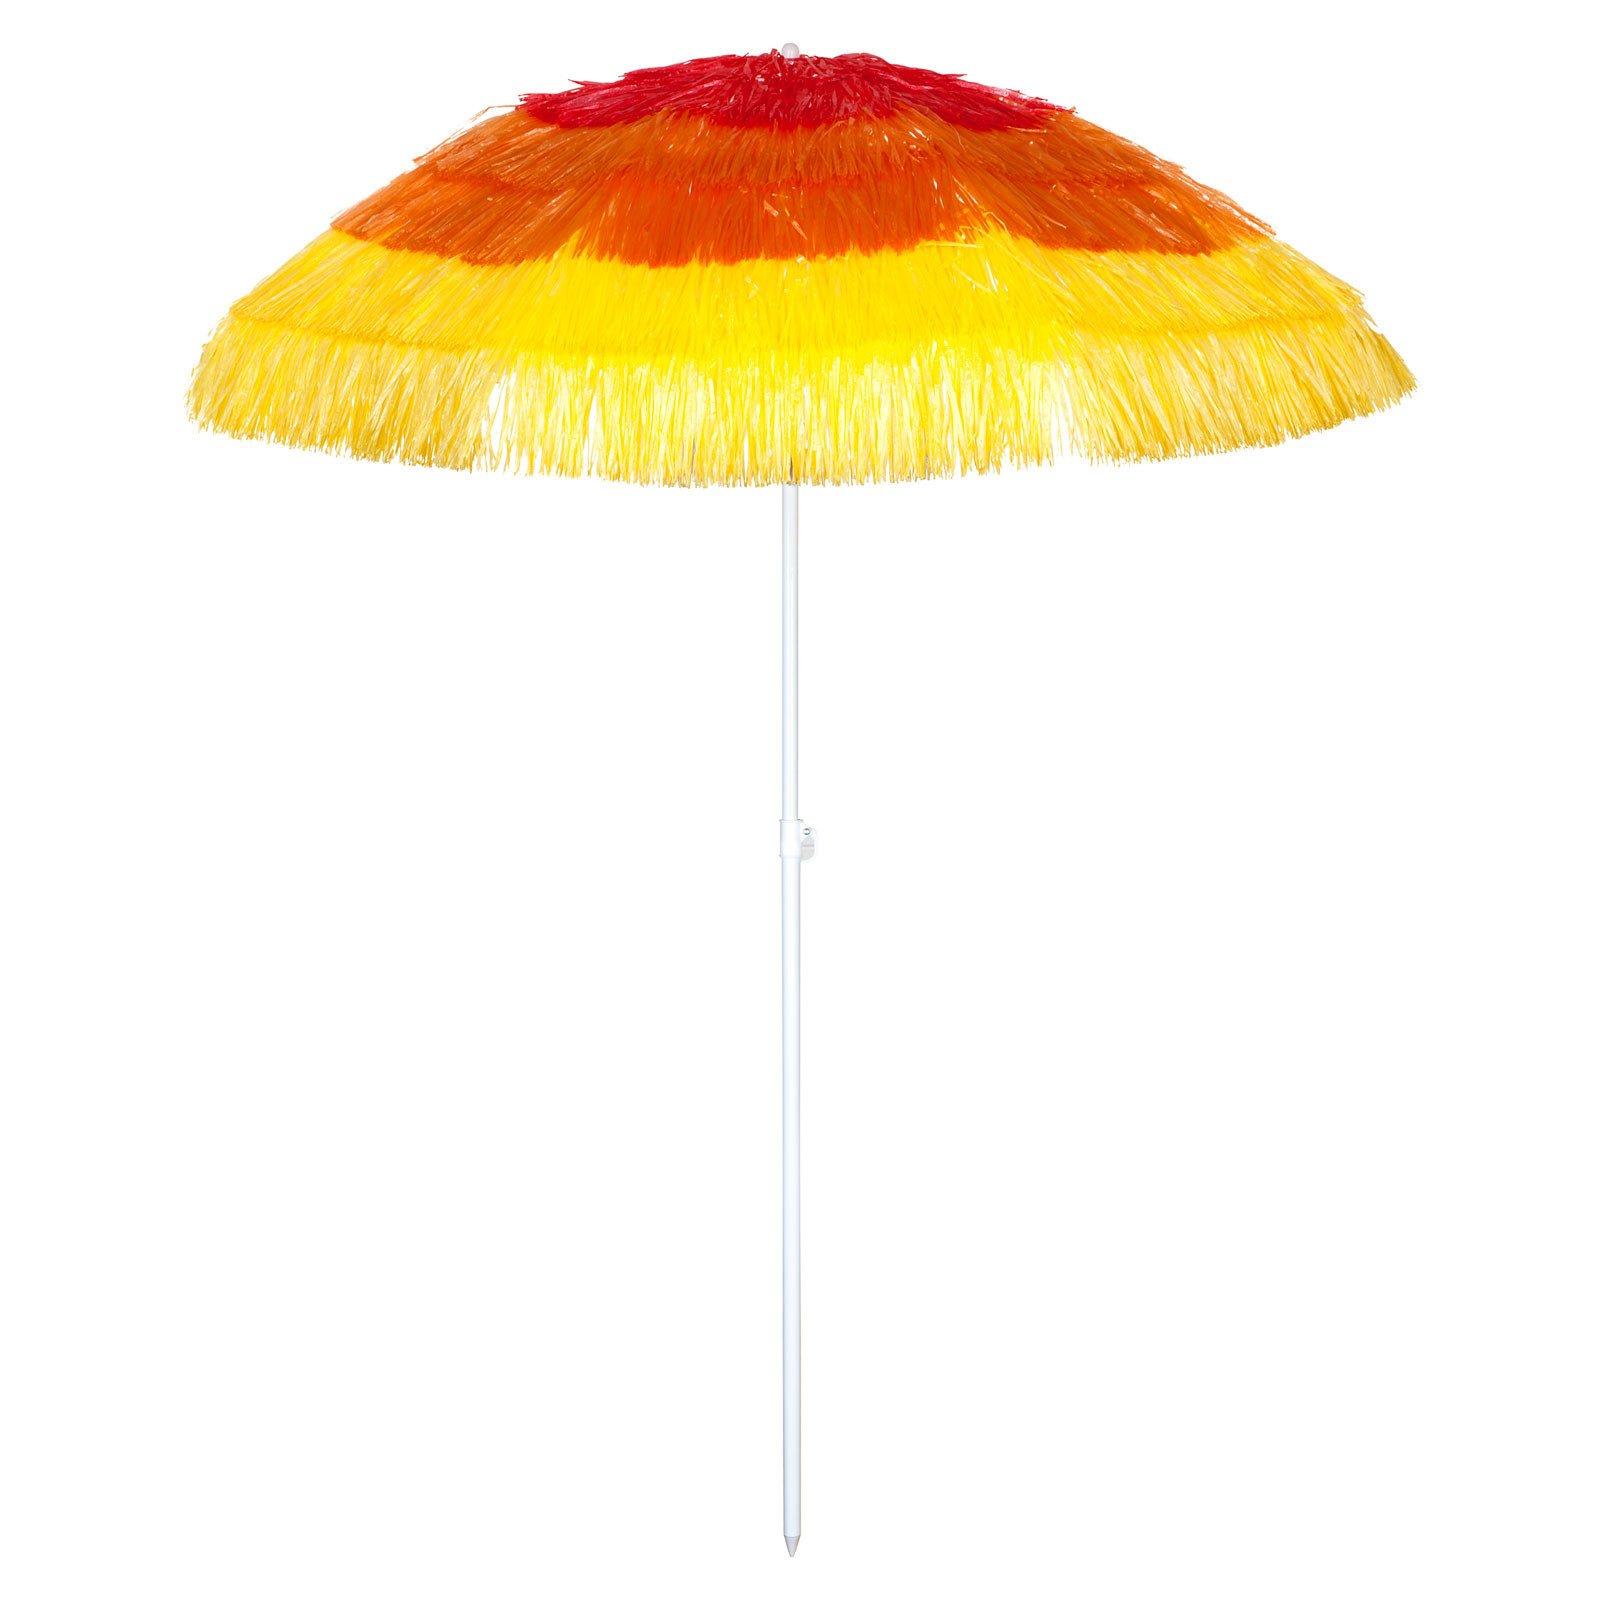 SunnyLIFE Carnival Travel Beach Umbrella - Sundowners